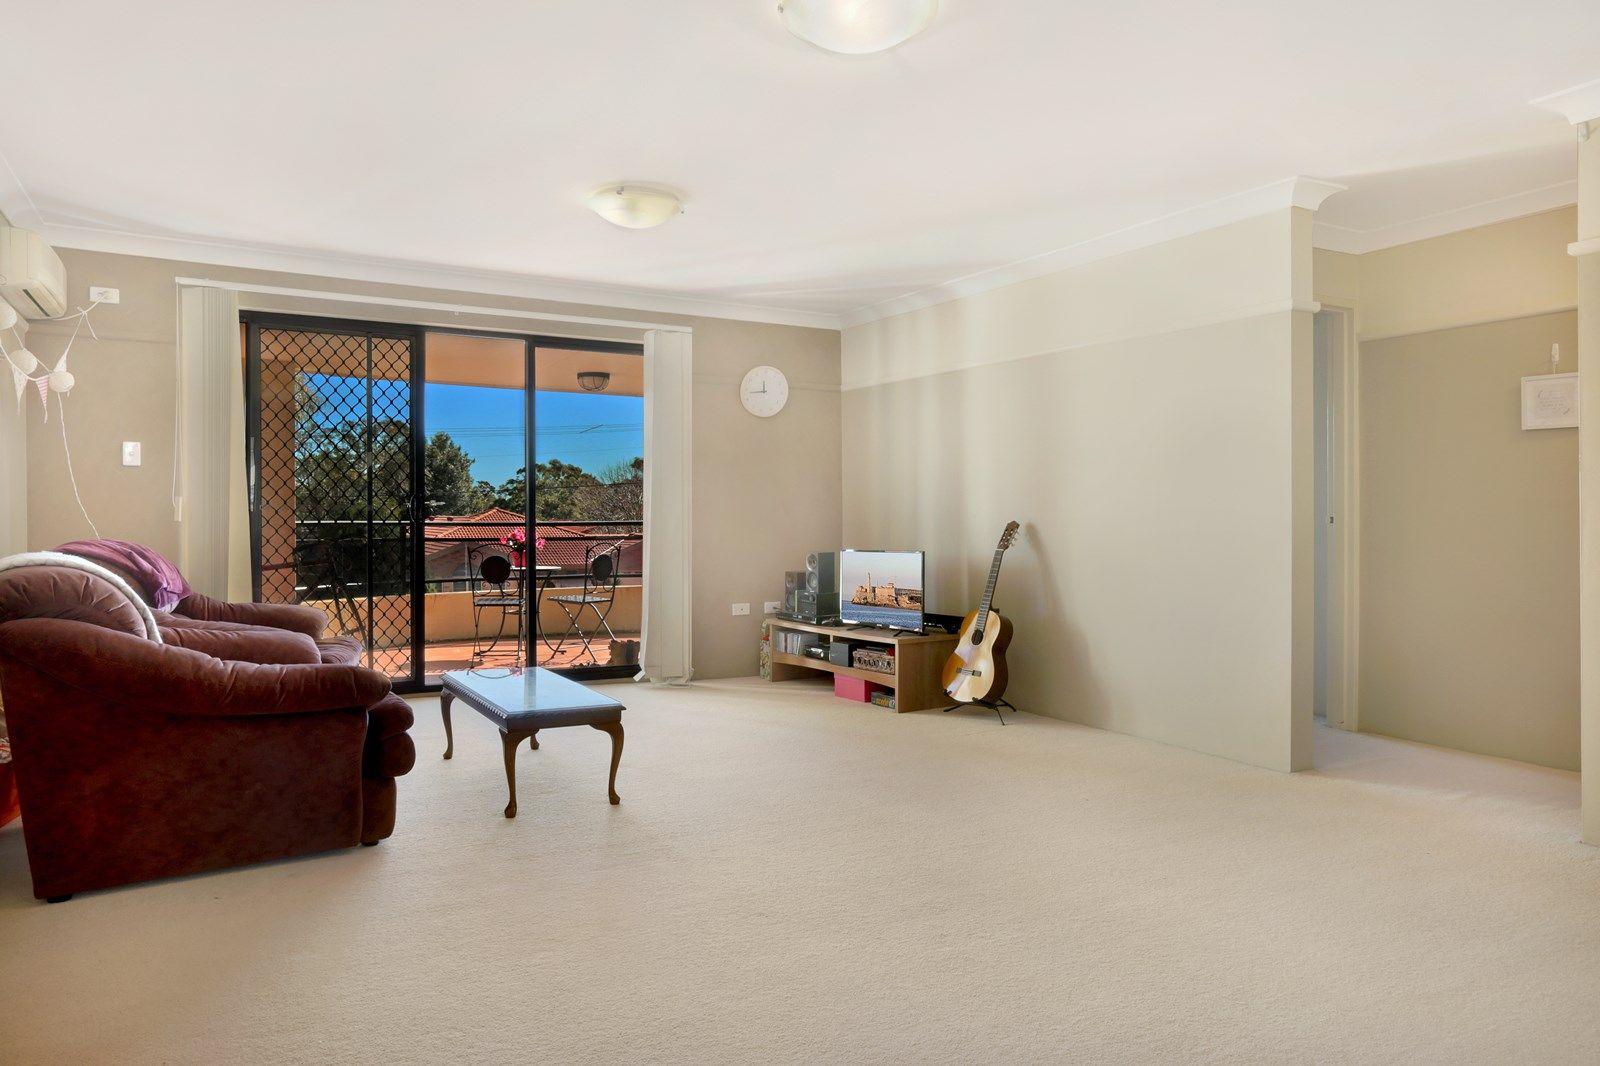 19/78-82 Old Northern Road, Baulkham Hills NSW 2153, Image 1